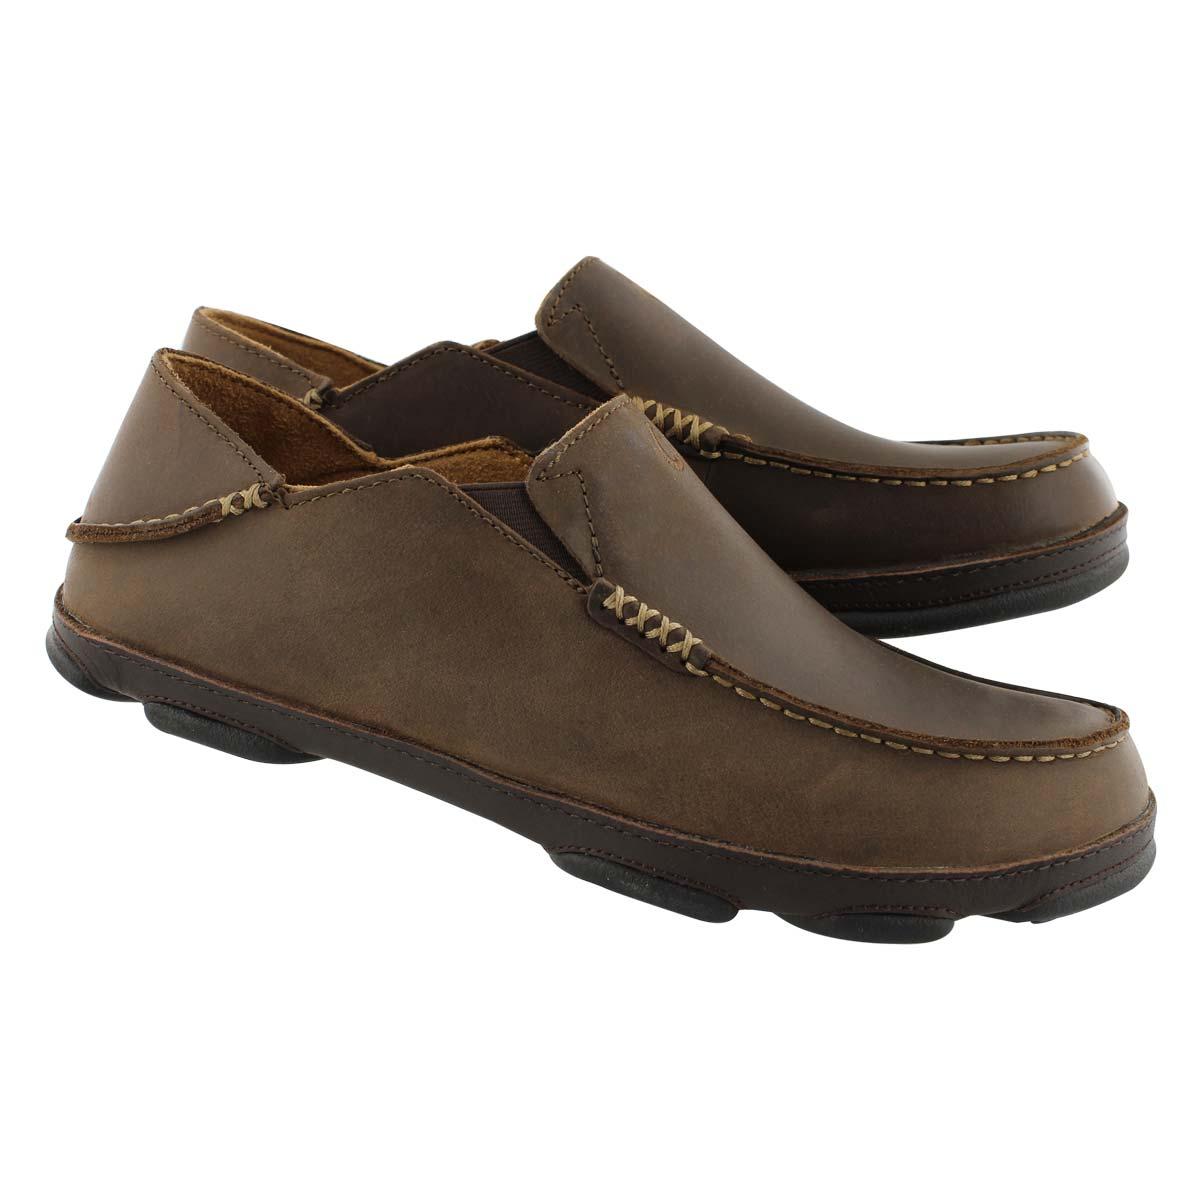 Mns Moloa dk wd/java slip on casual shoe